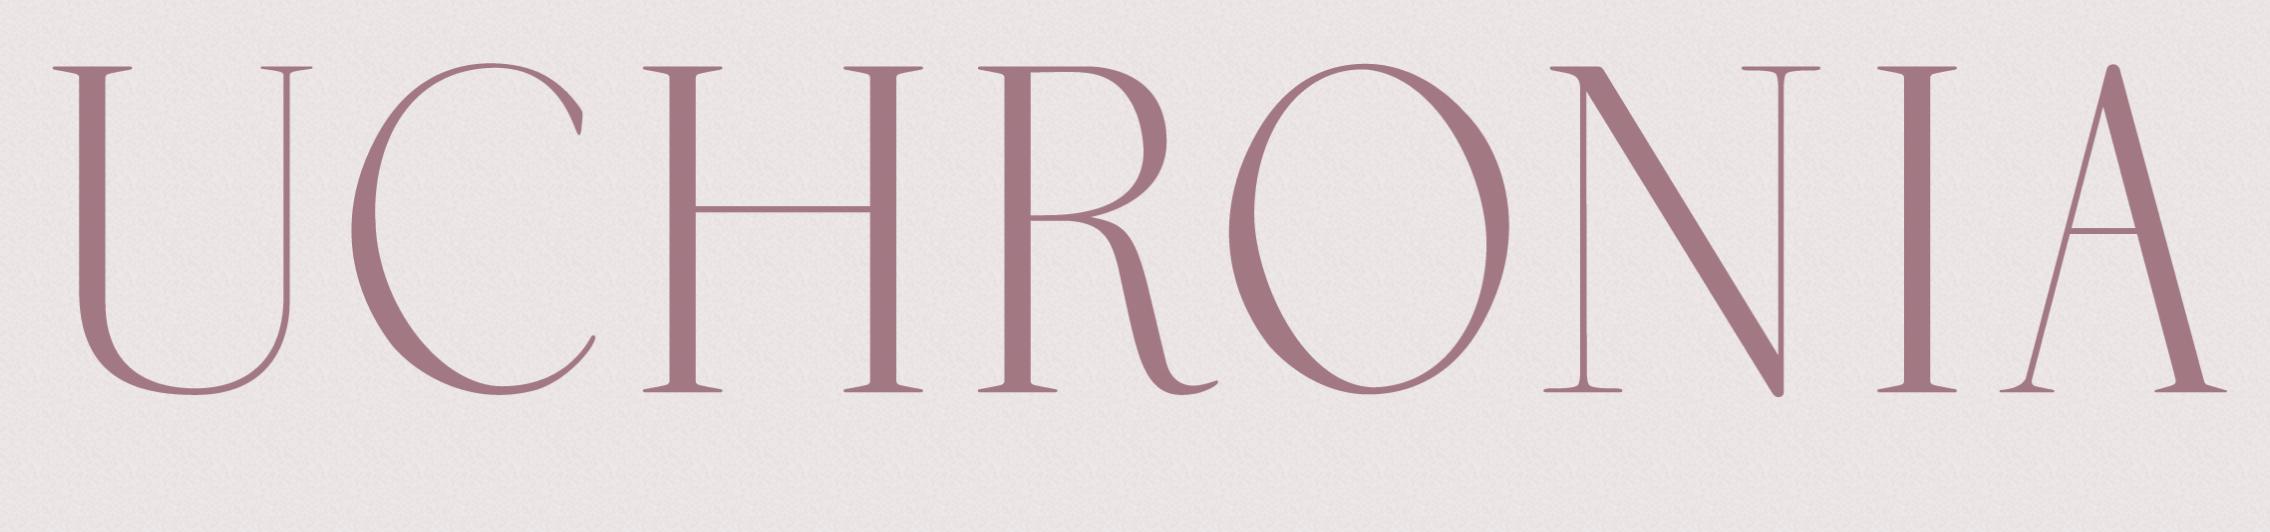 8 Beautiful Fonts That'll Make Your Marketing Look Like a Million Bucks